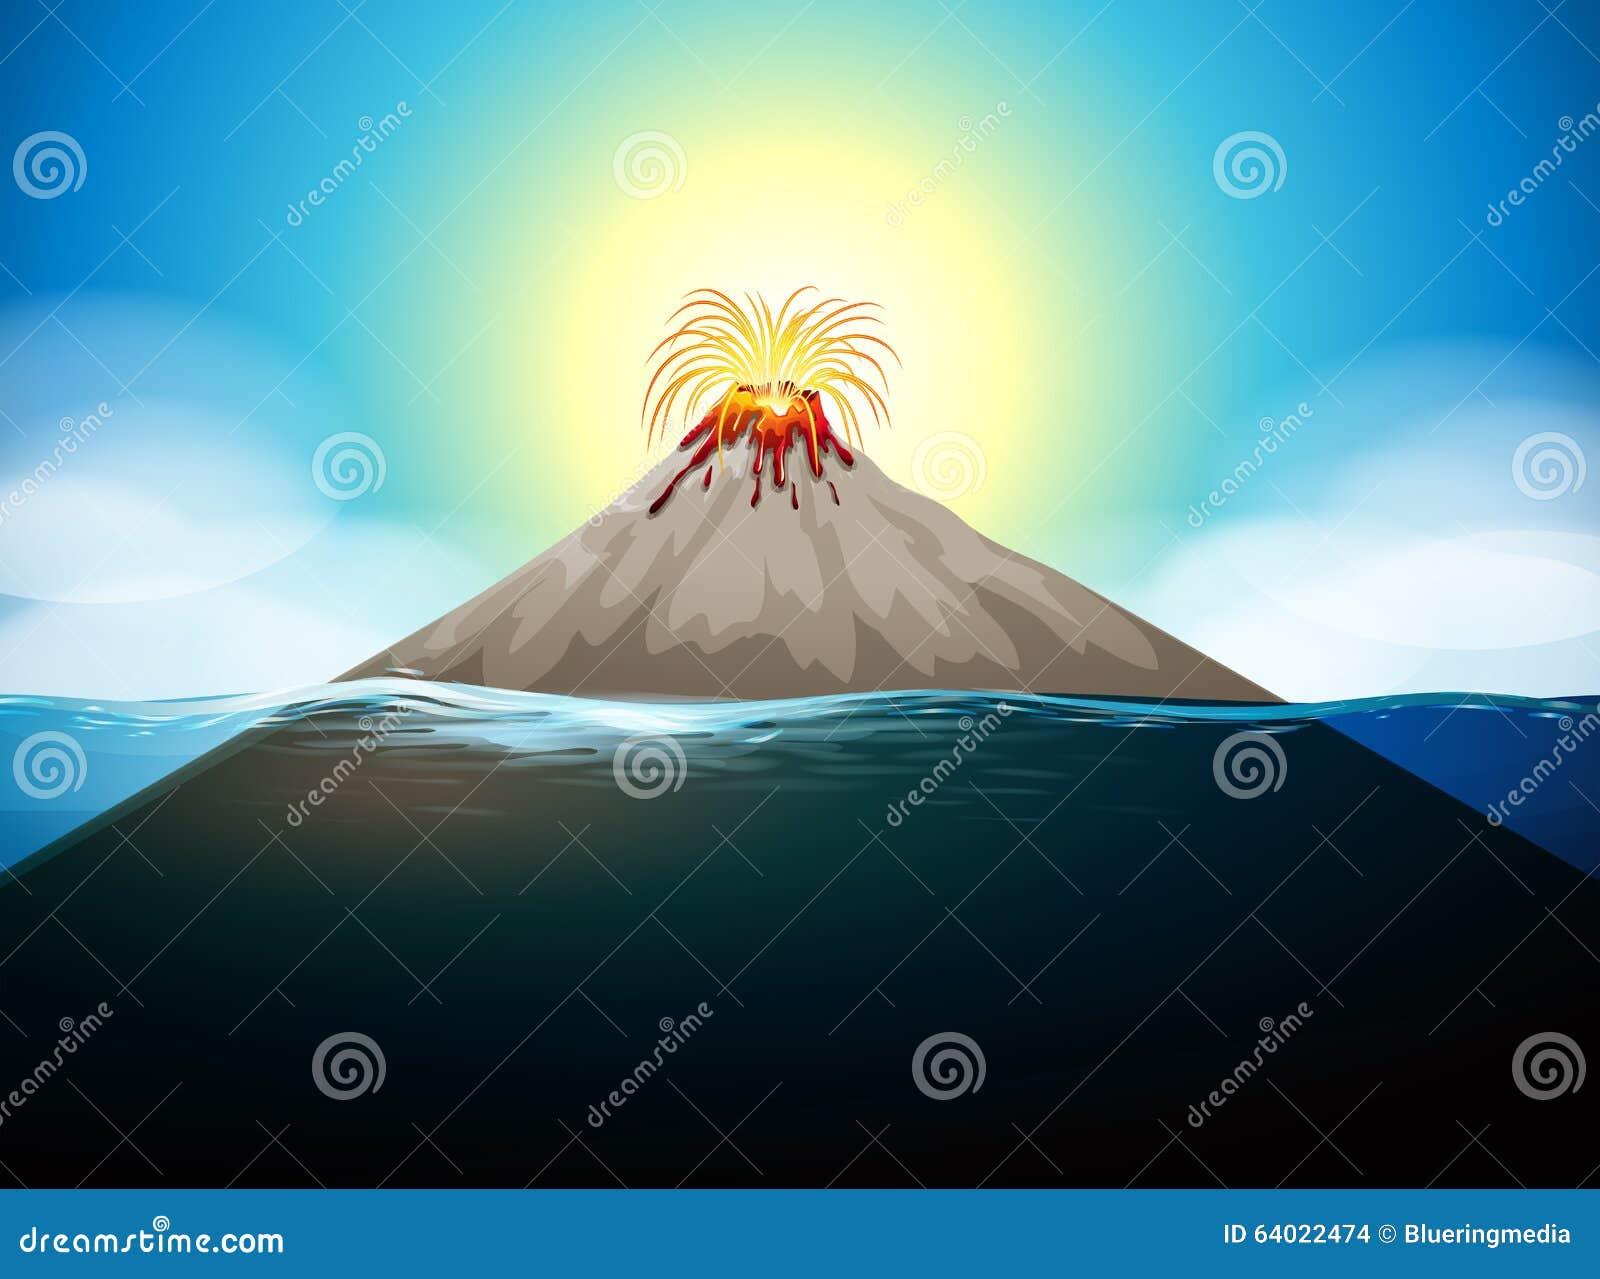 Volcano Eruption In Th...